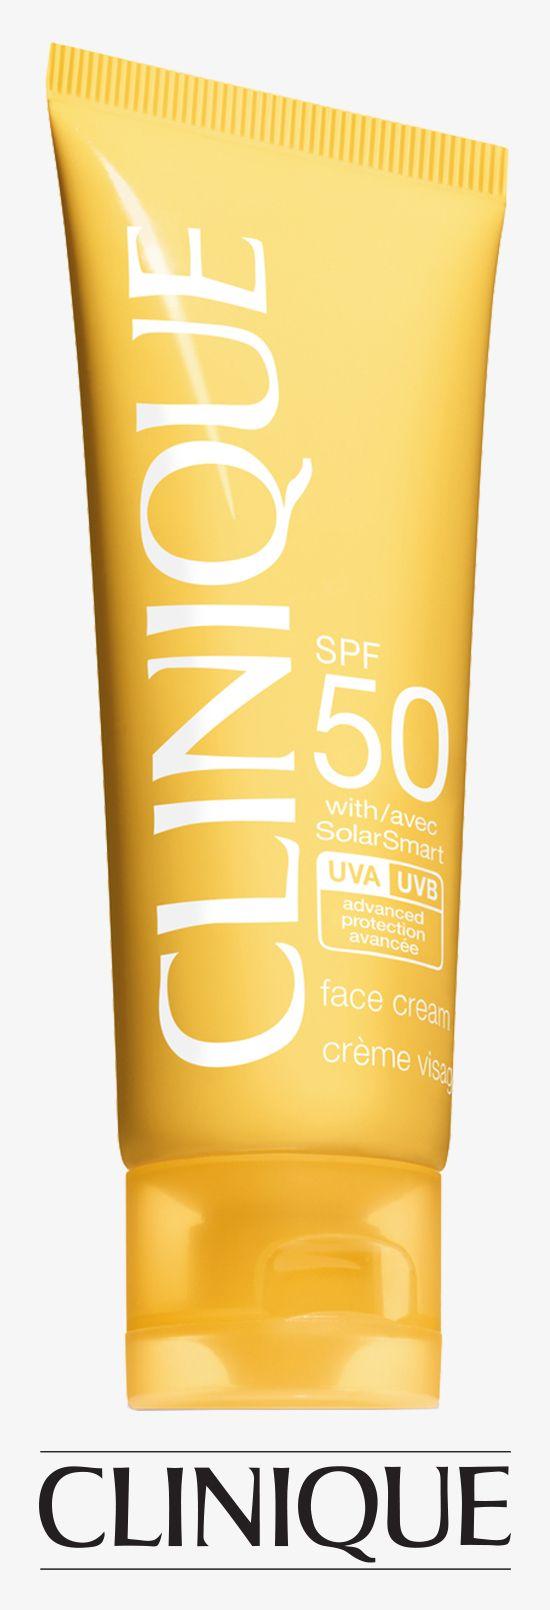 Strong #sun protection gentle enough for sensitive skins. #Clinique Sun Broad Spectrum SPF 50 Sunscreen Face Cream.